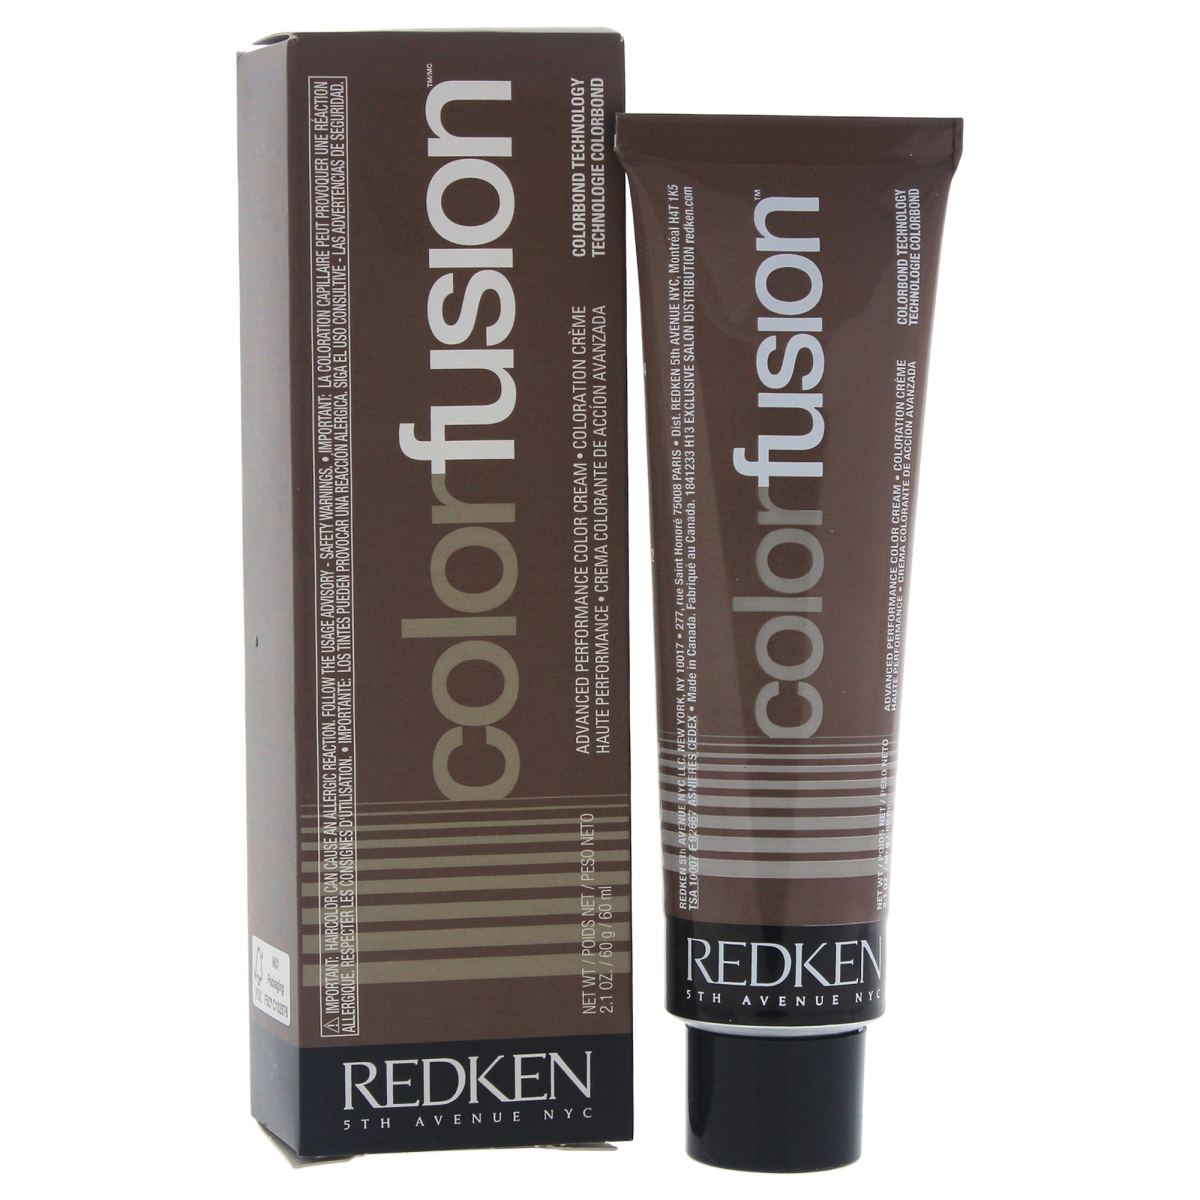 Redken U-HC-11723 2.1 oz Color Fusion Cream No. 1 Natural Balance Hair Color for Unisex Ash Blue